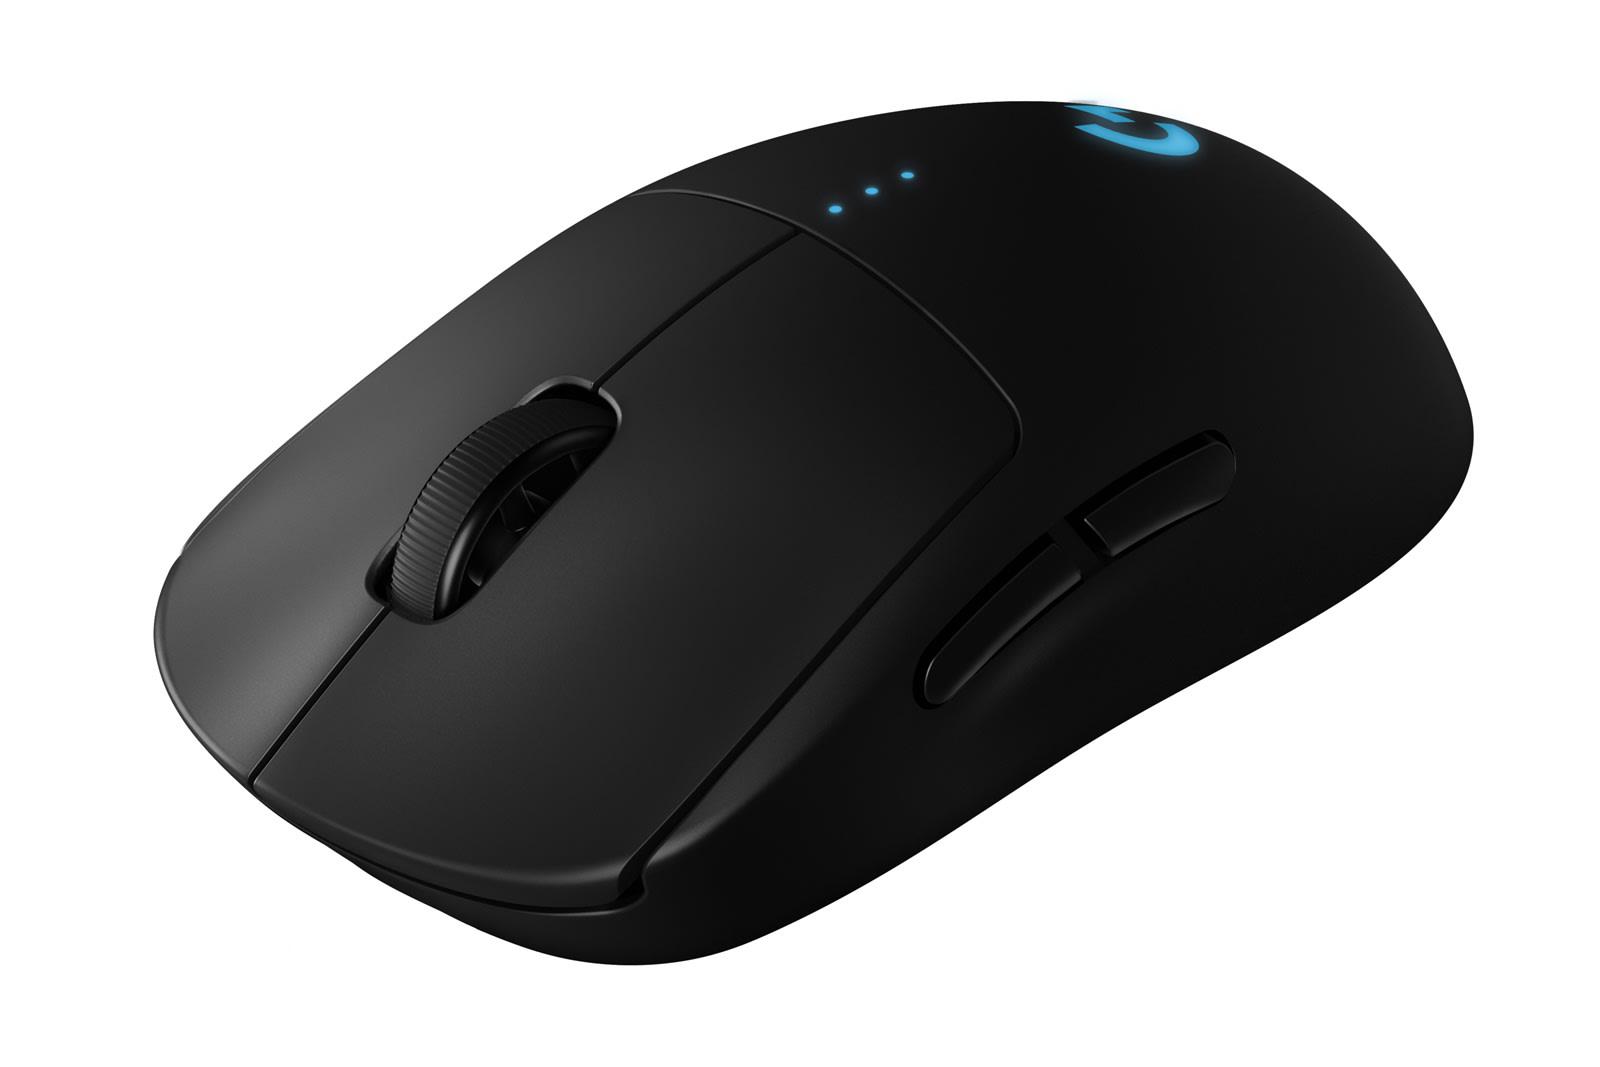 bcb65baa040 Logitech. Wireless gaming mice are anathema to esports ...